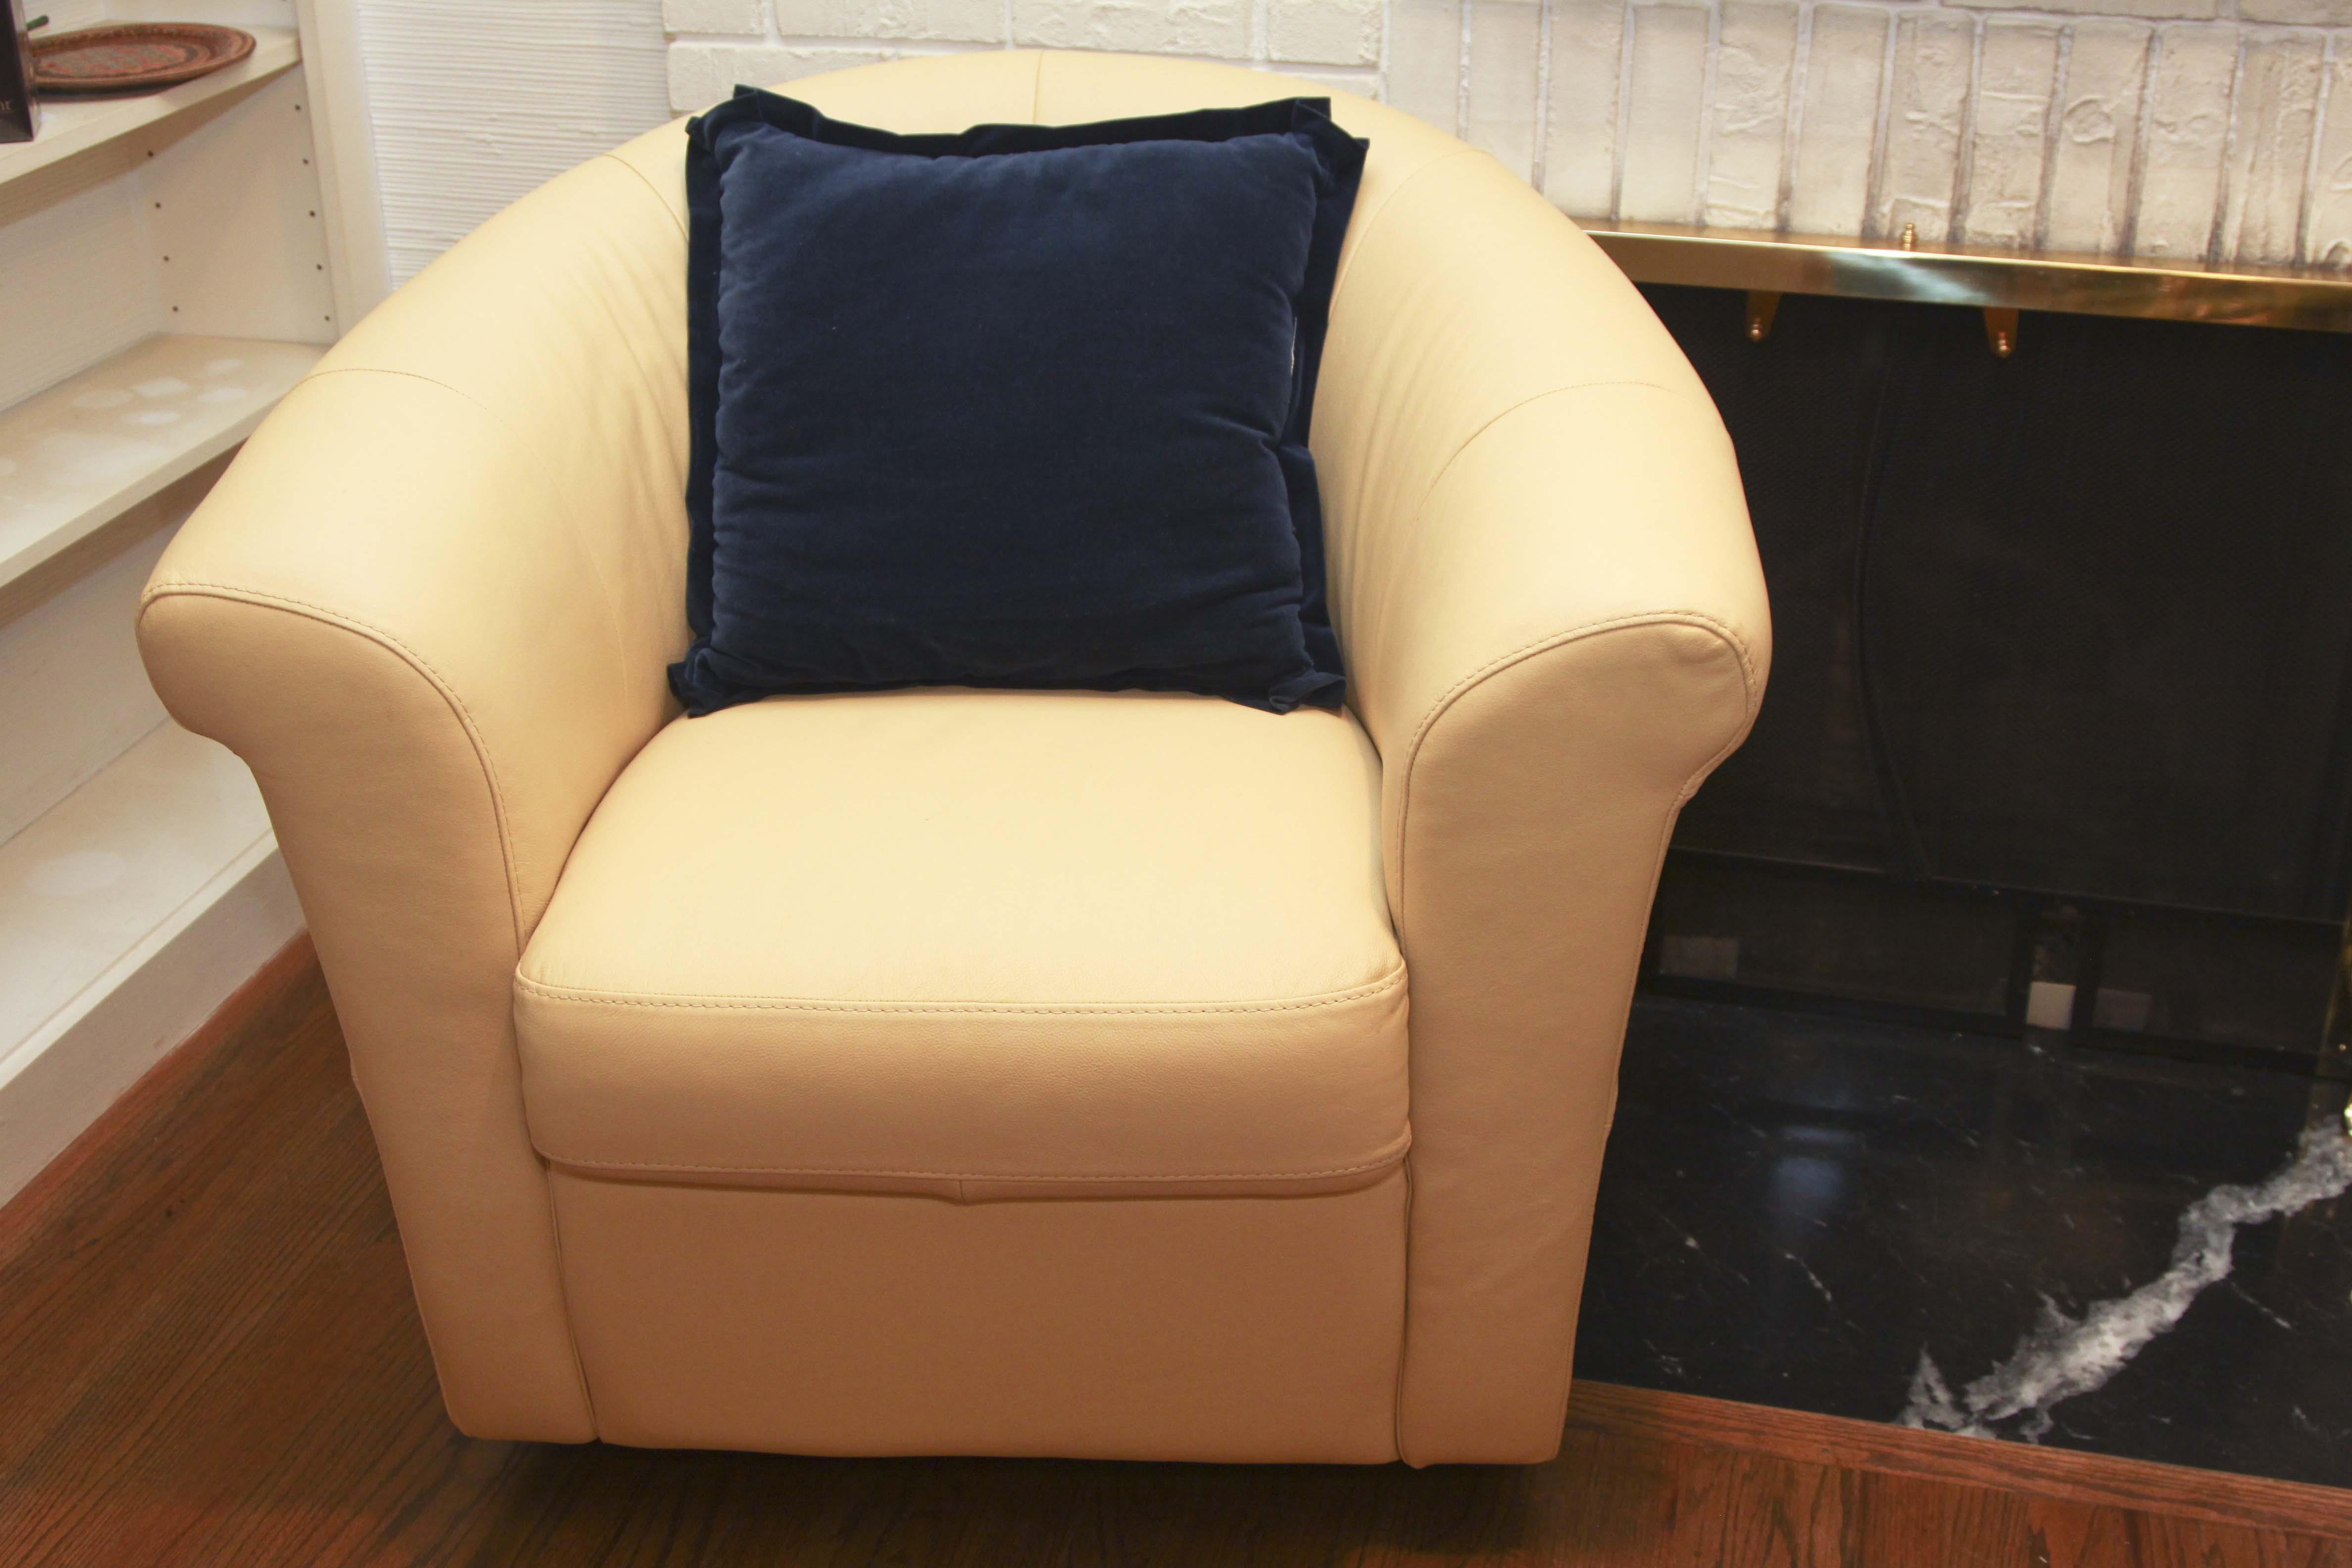 italsofa leather swivel chair sleeper sofa buttercup yellow : ebth